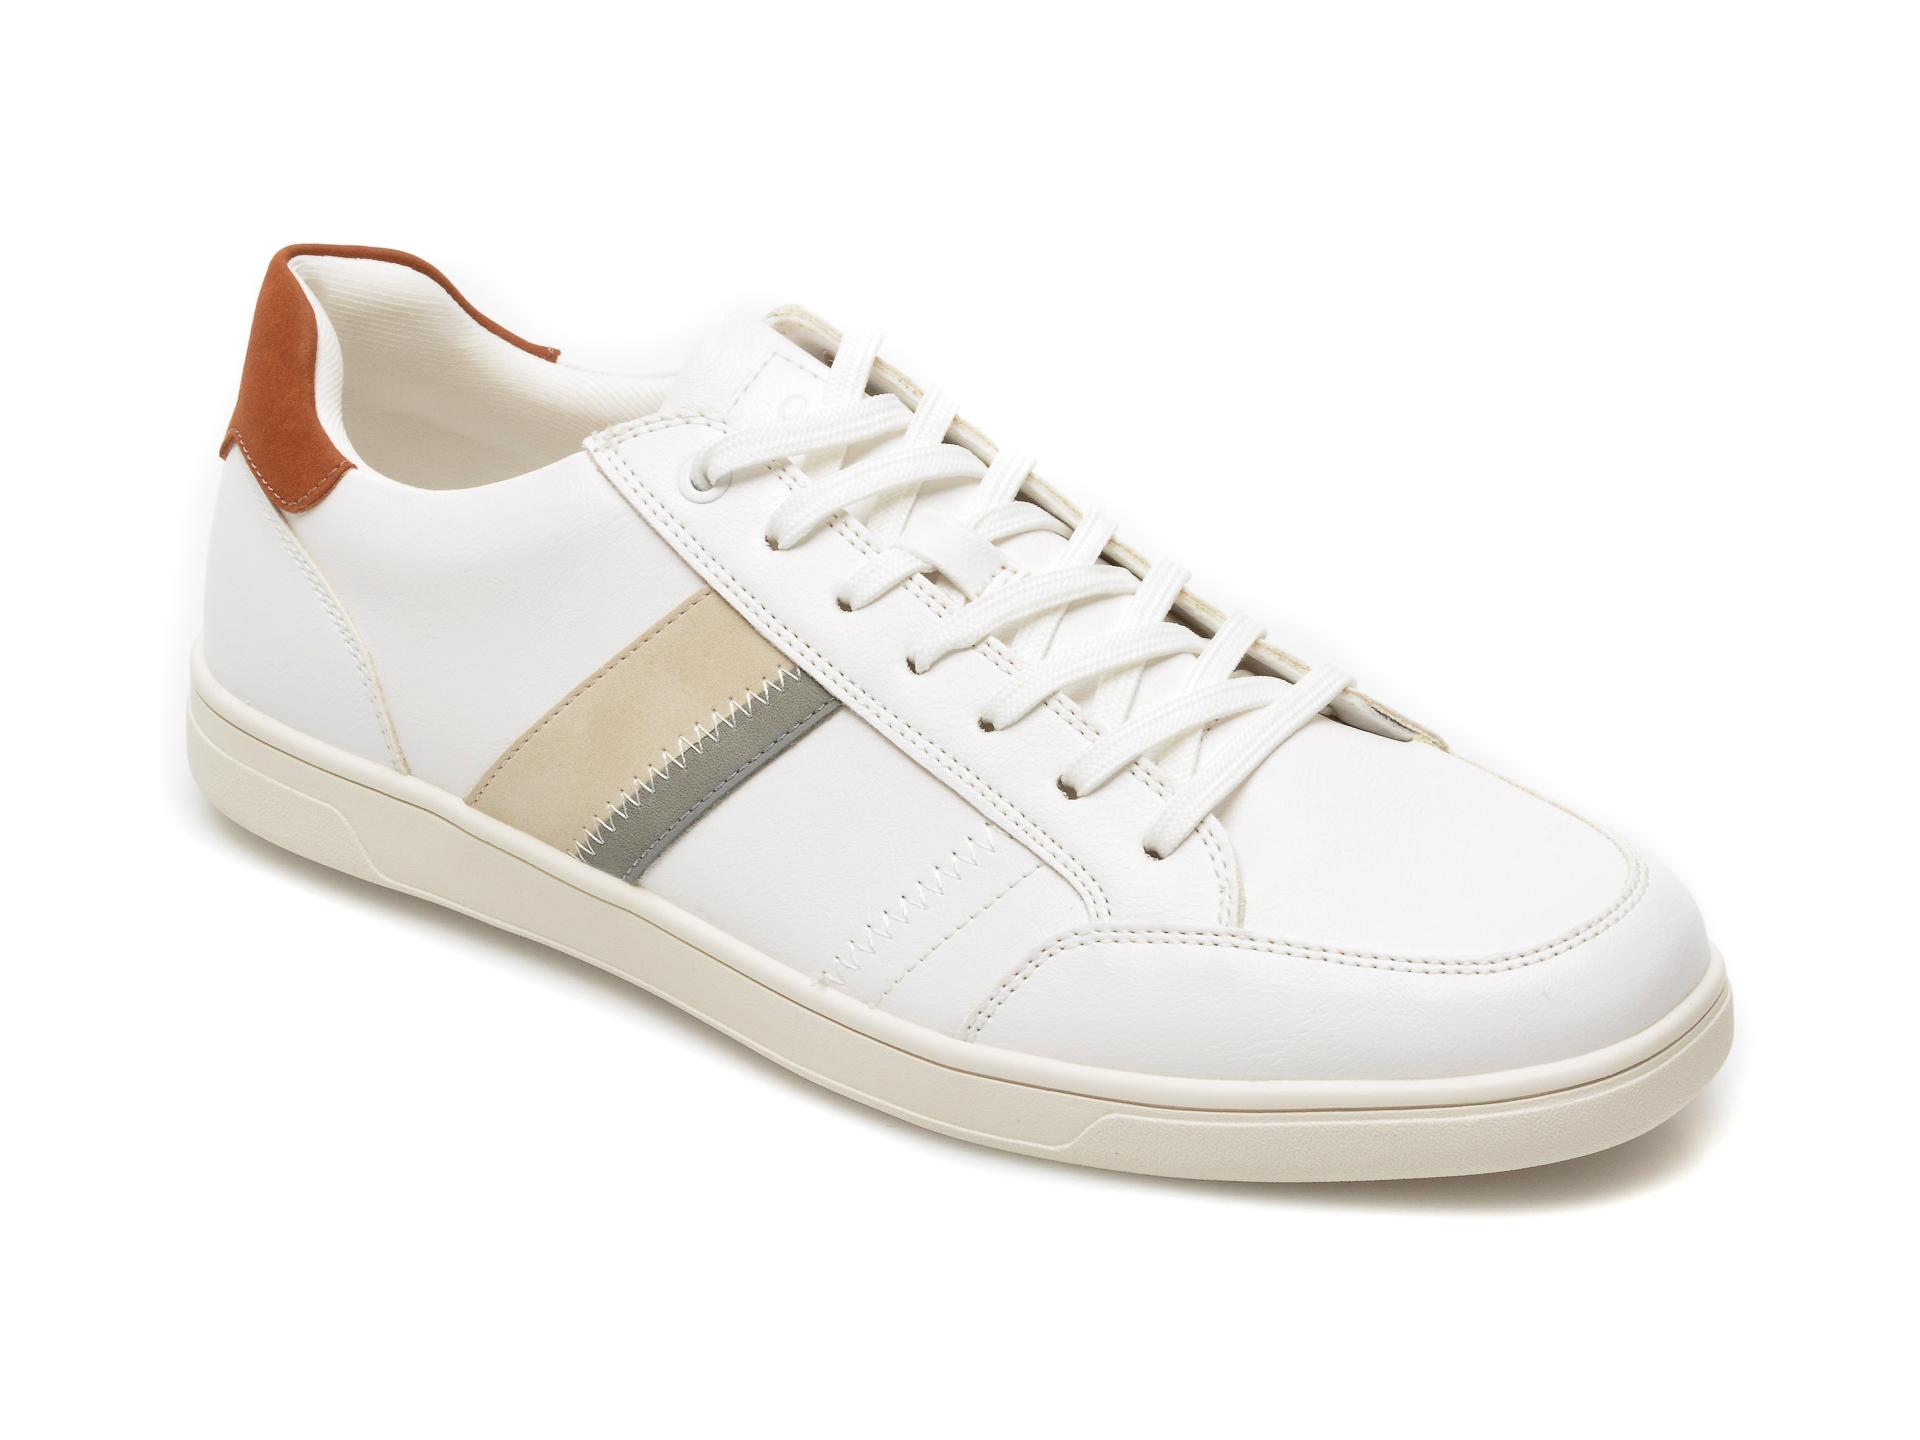 Pantofi sport ALDO albi, Dunkeld100, din piele ecologica imagine otter.ro 2021